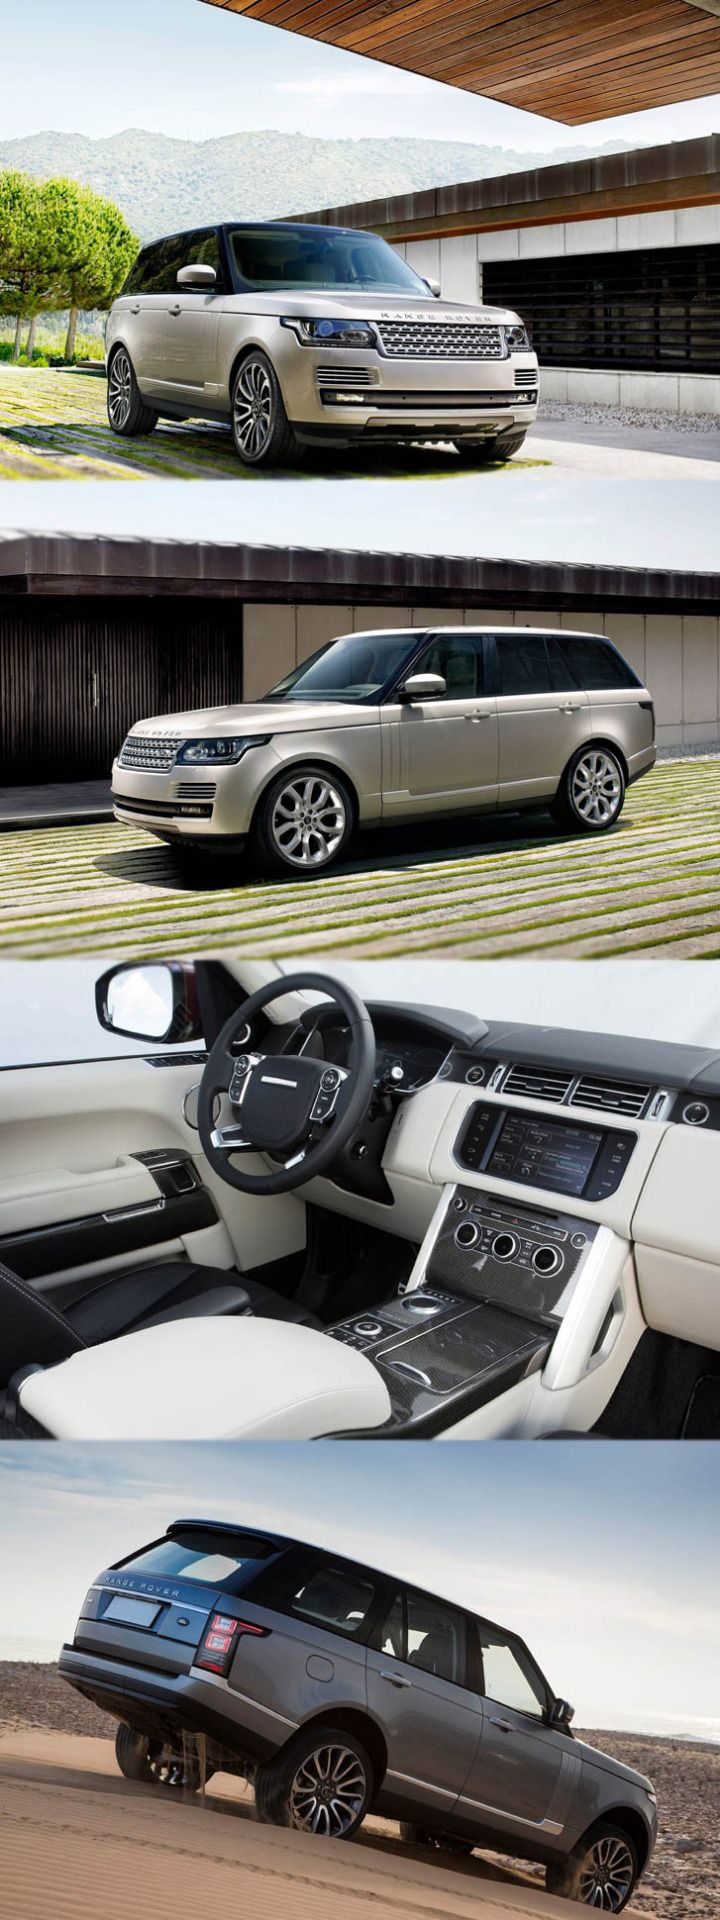 Ranger Over – Land Rover/Range Rover